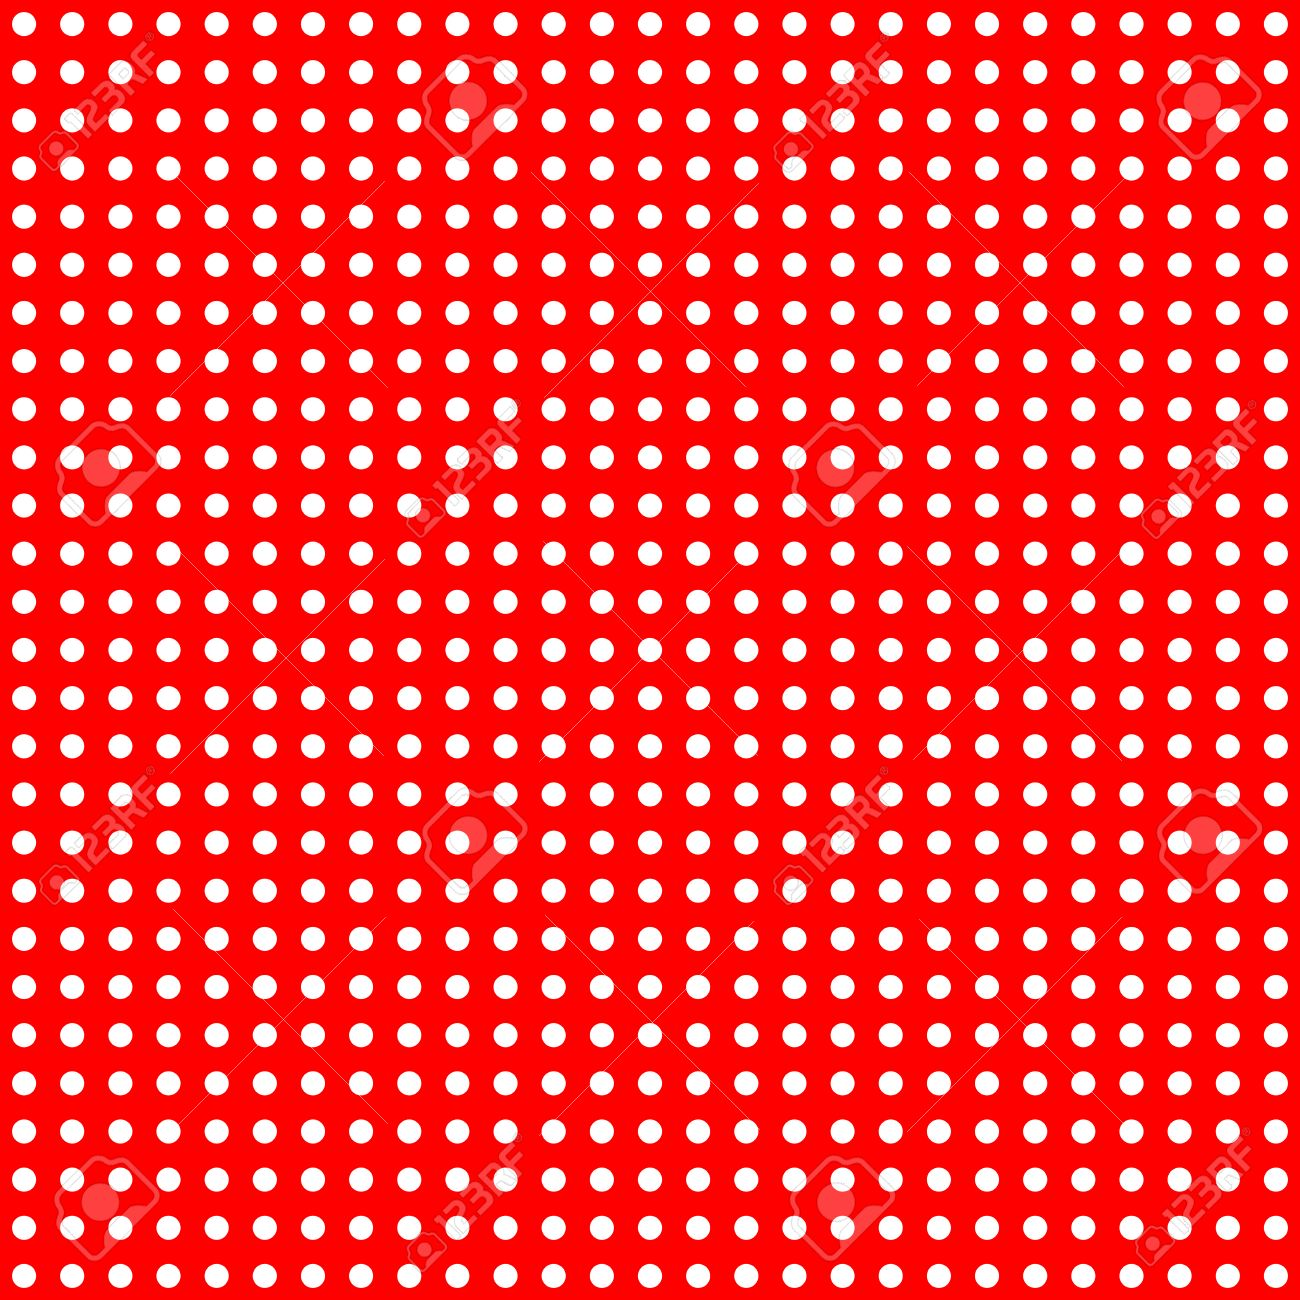 Fondo rojo puntos blanco